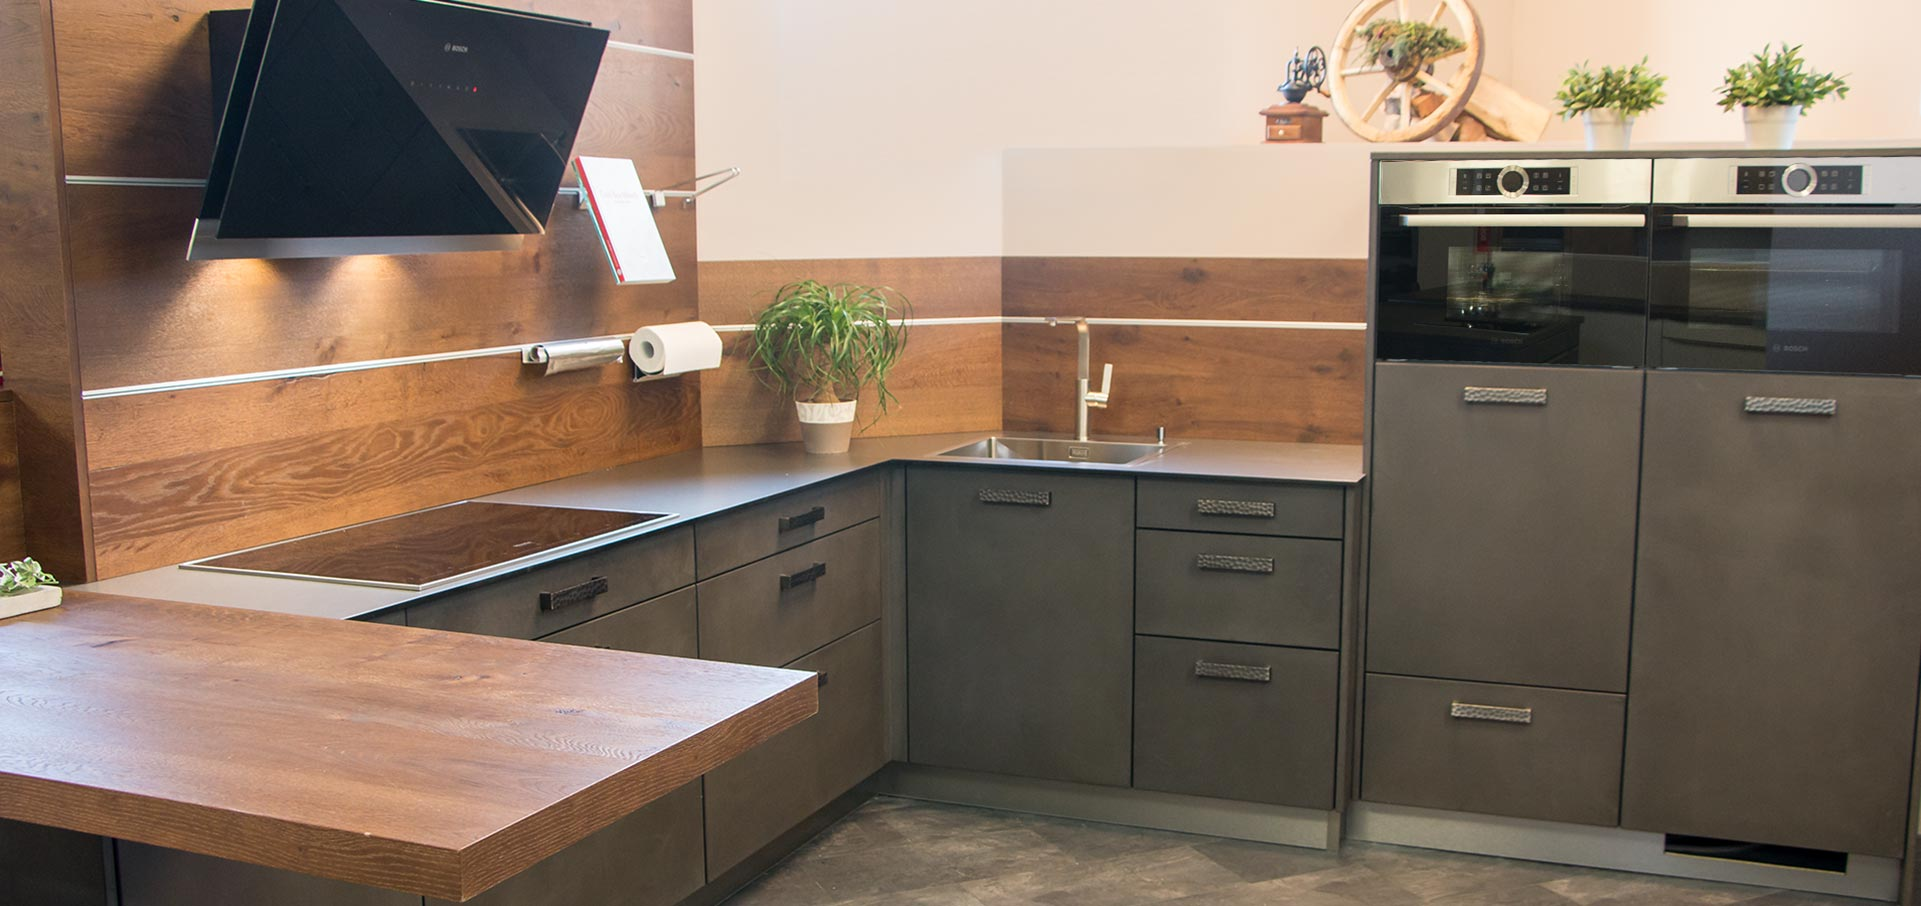 ausstellung. Black Bedroom Furniture Sets. Home Design Ideas